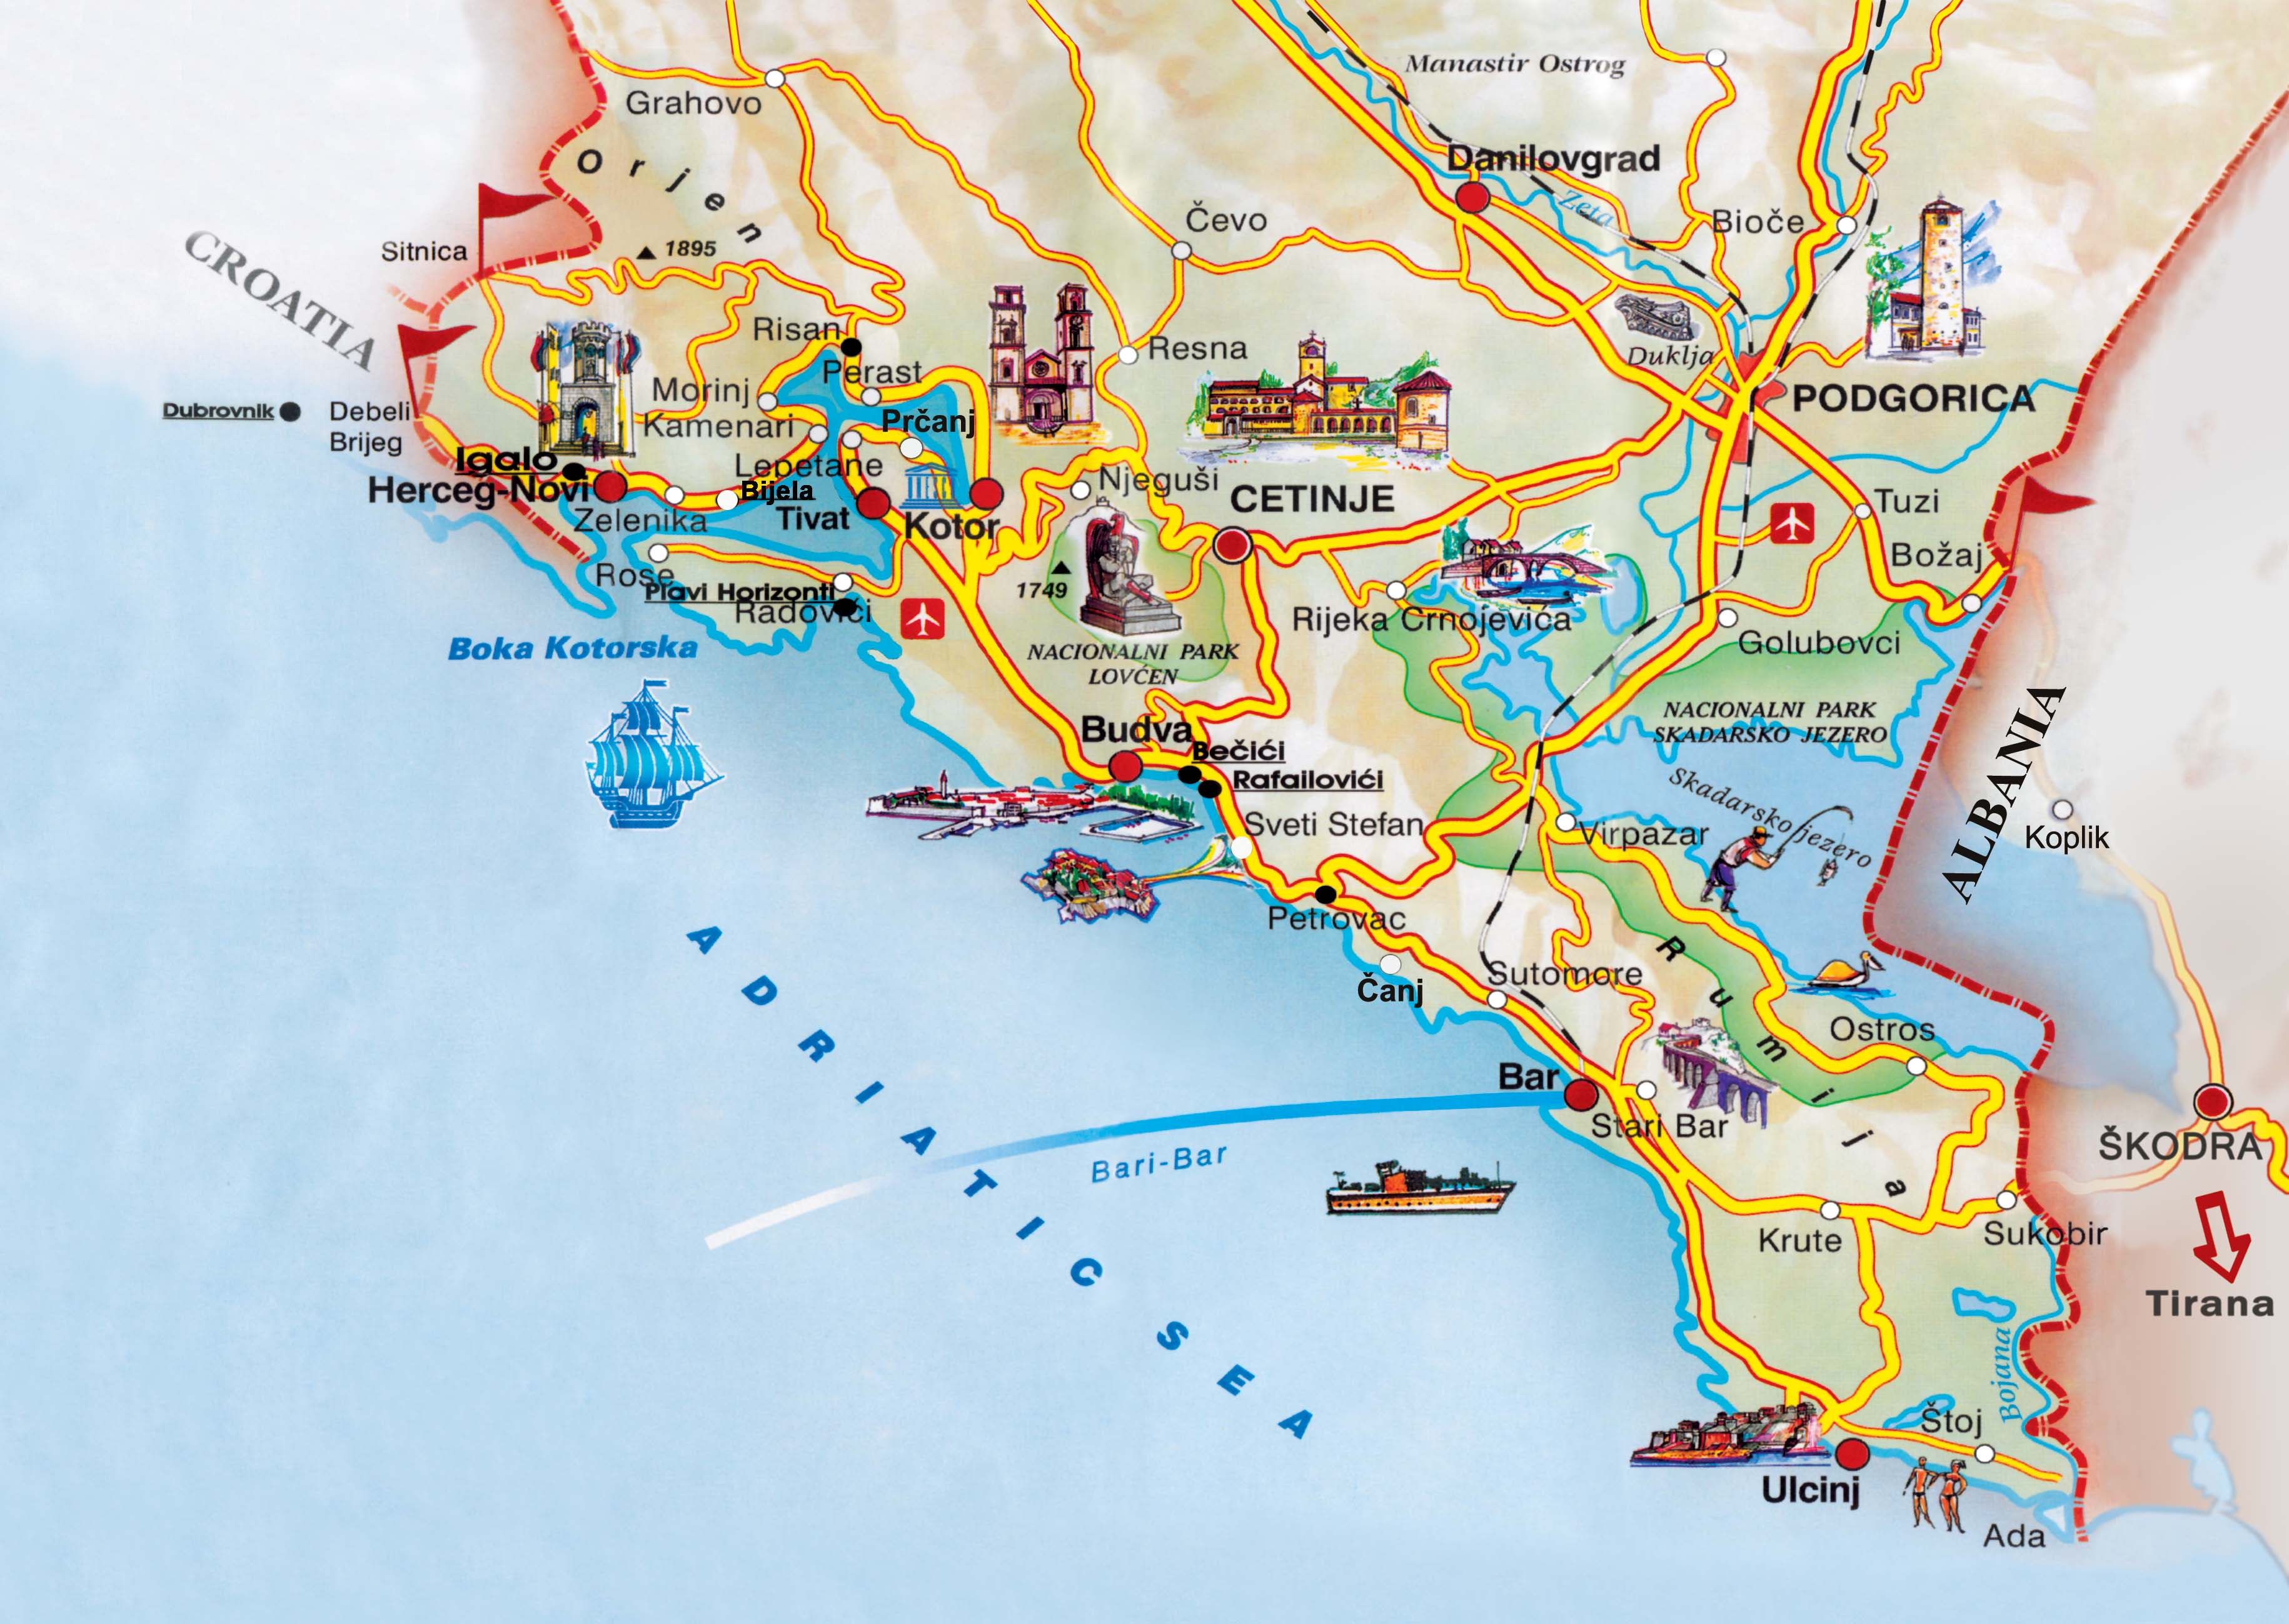 montenegro térkép Montenegro: Térkép Montenegro (kép) montenegro térkép